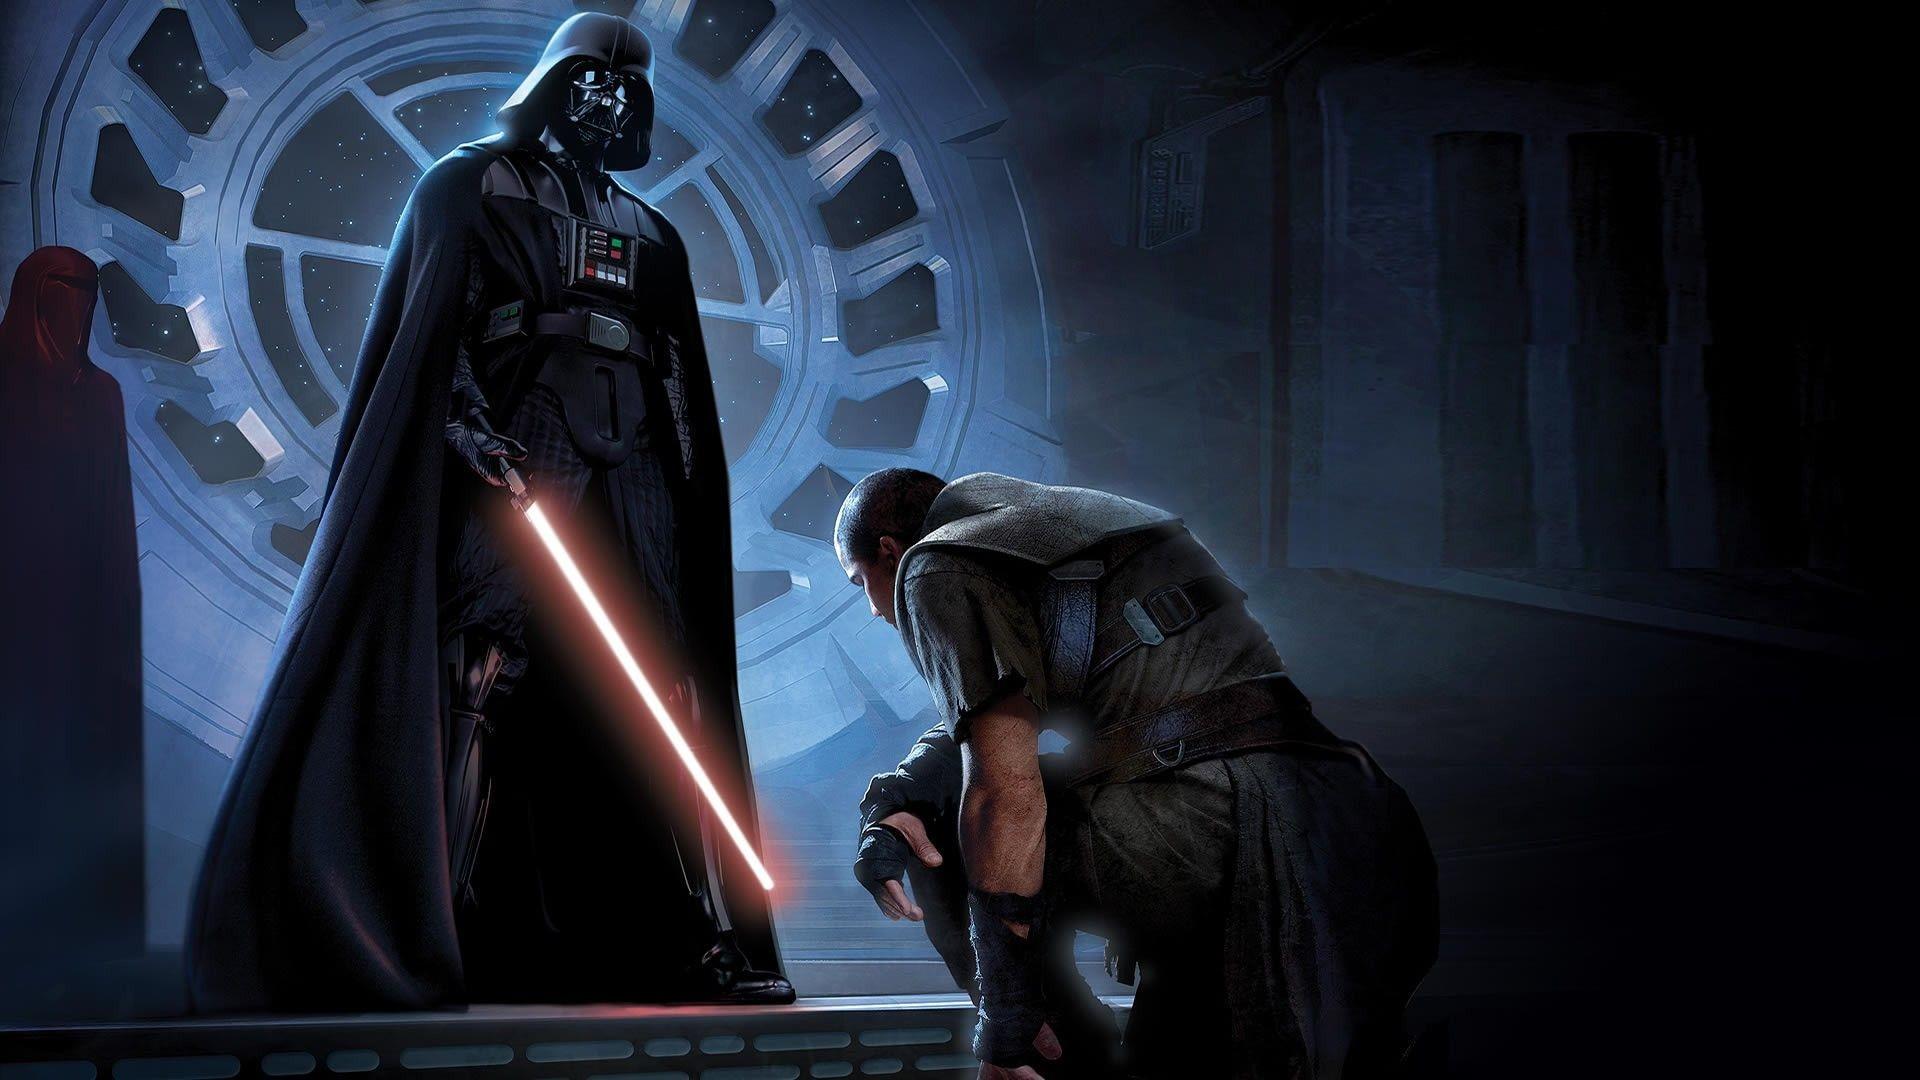 Darth Vader, Video Games, Star Wars, Star Wars: The Force .